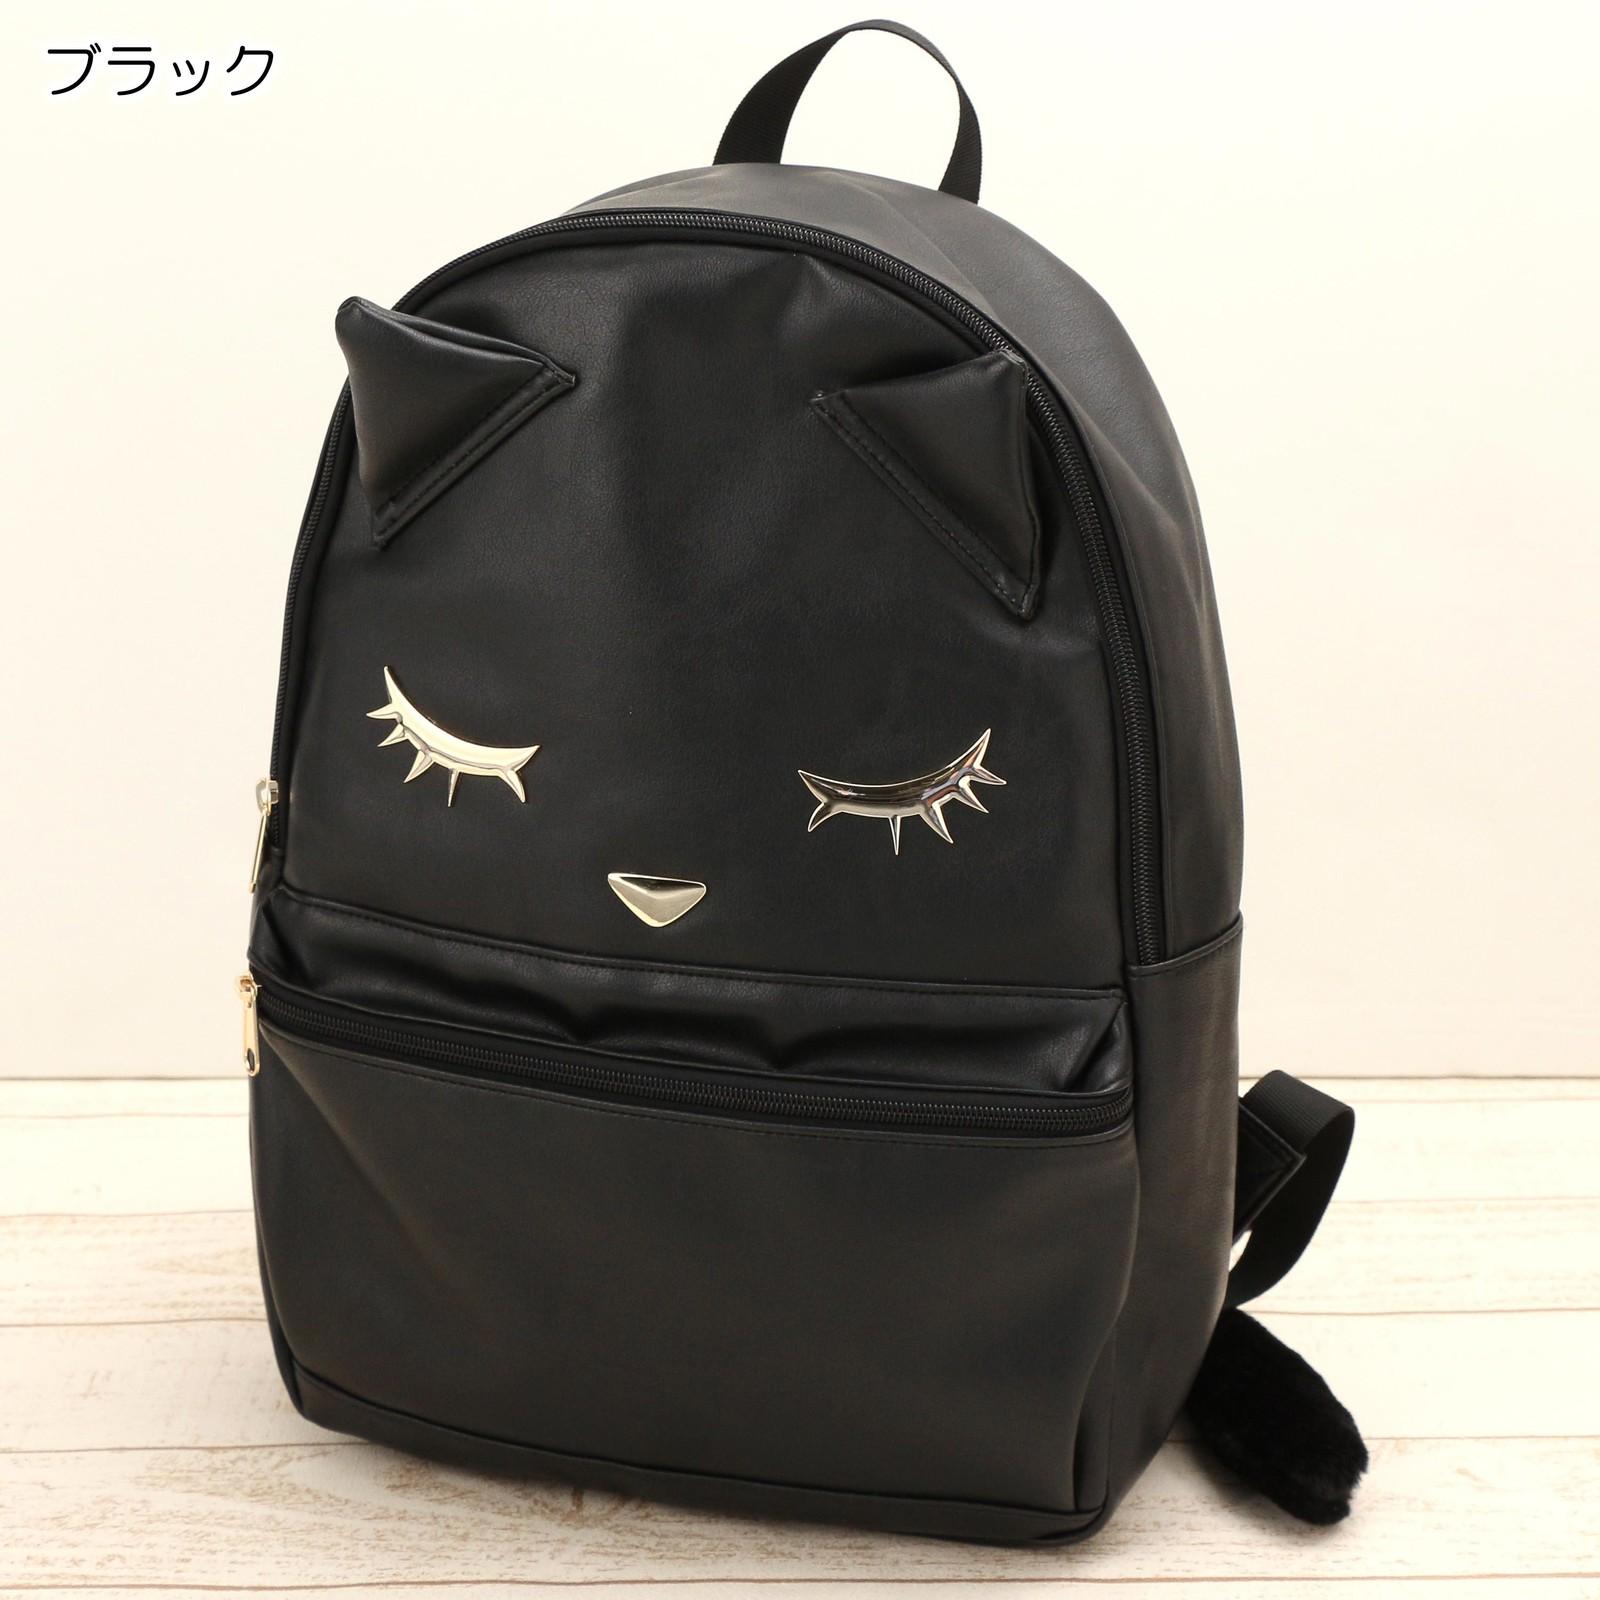 Osumashi Pooh-Chan I love Pooh Cat Backpack Book Bag Black